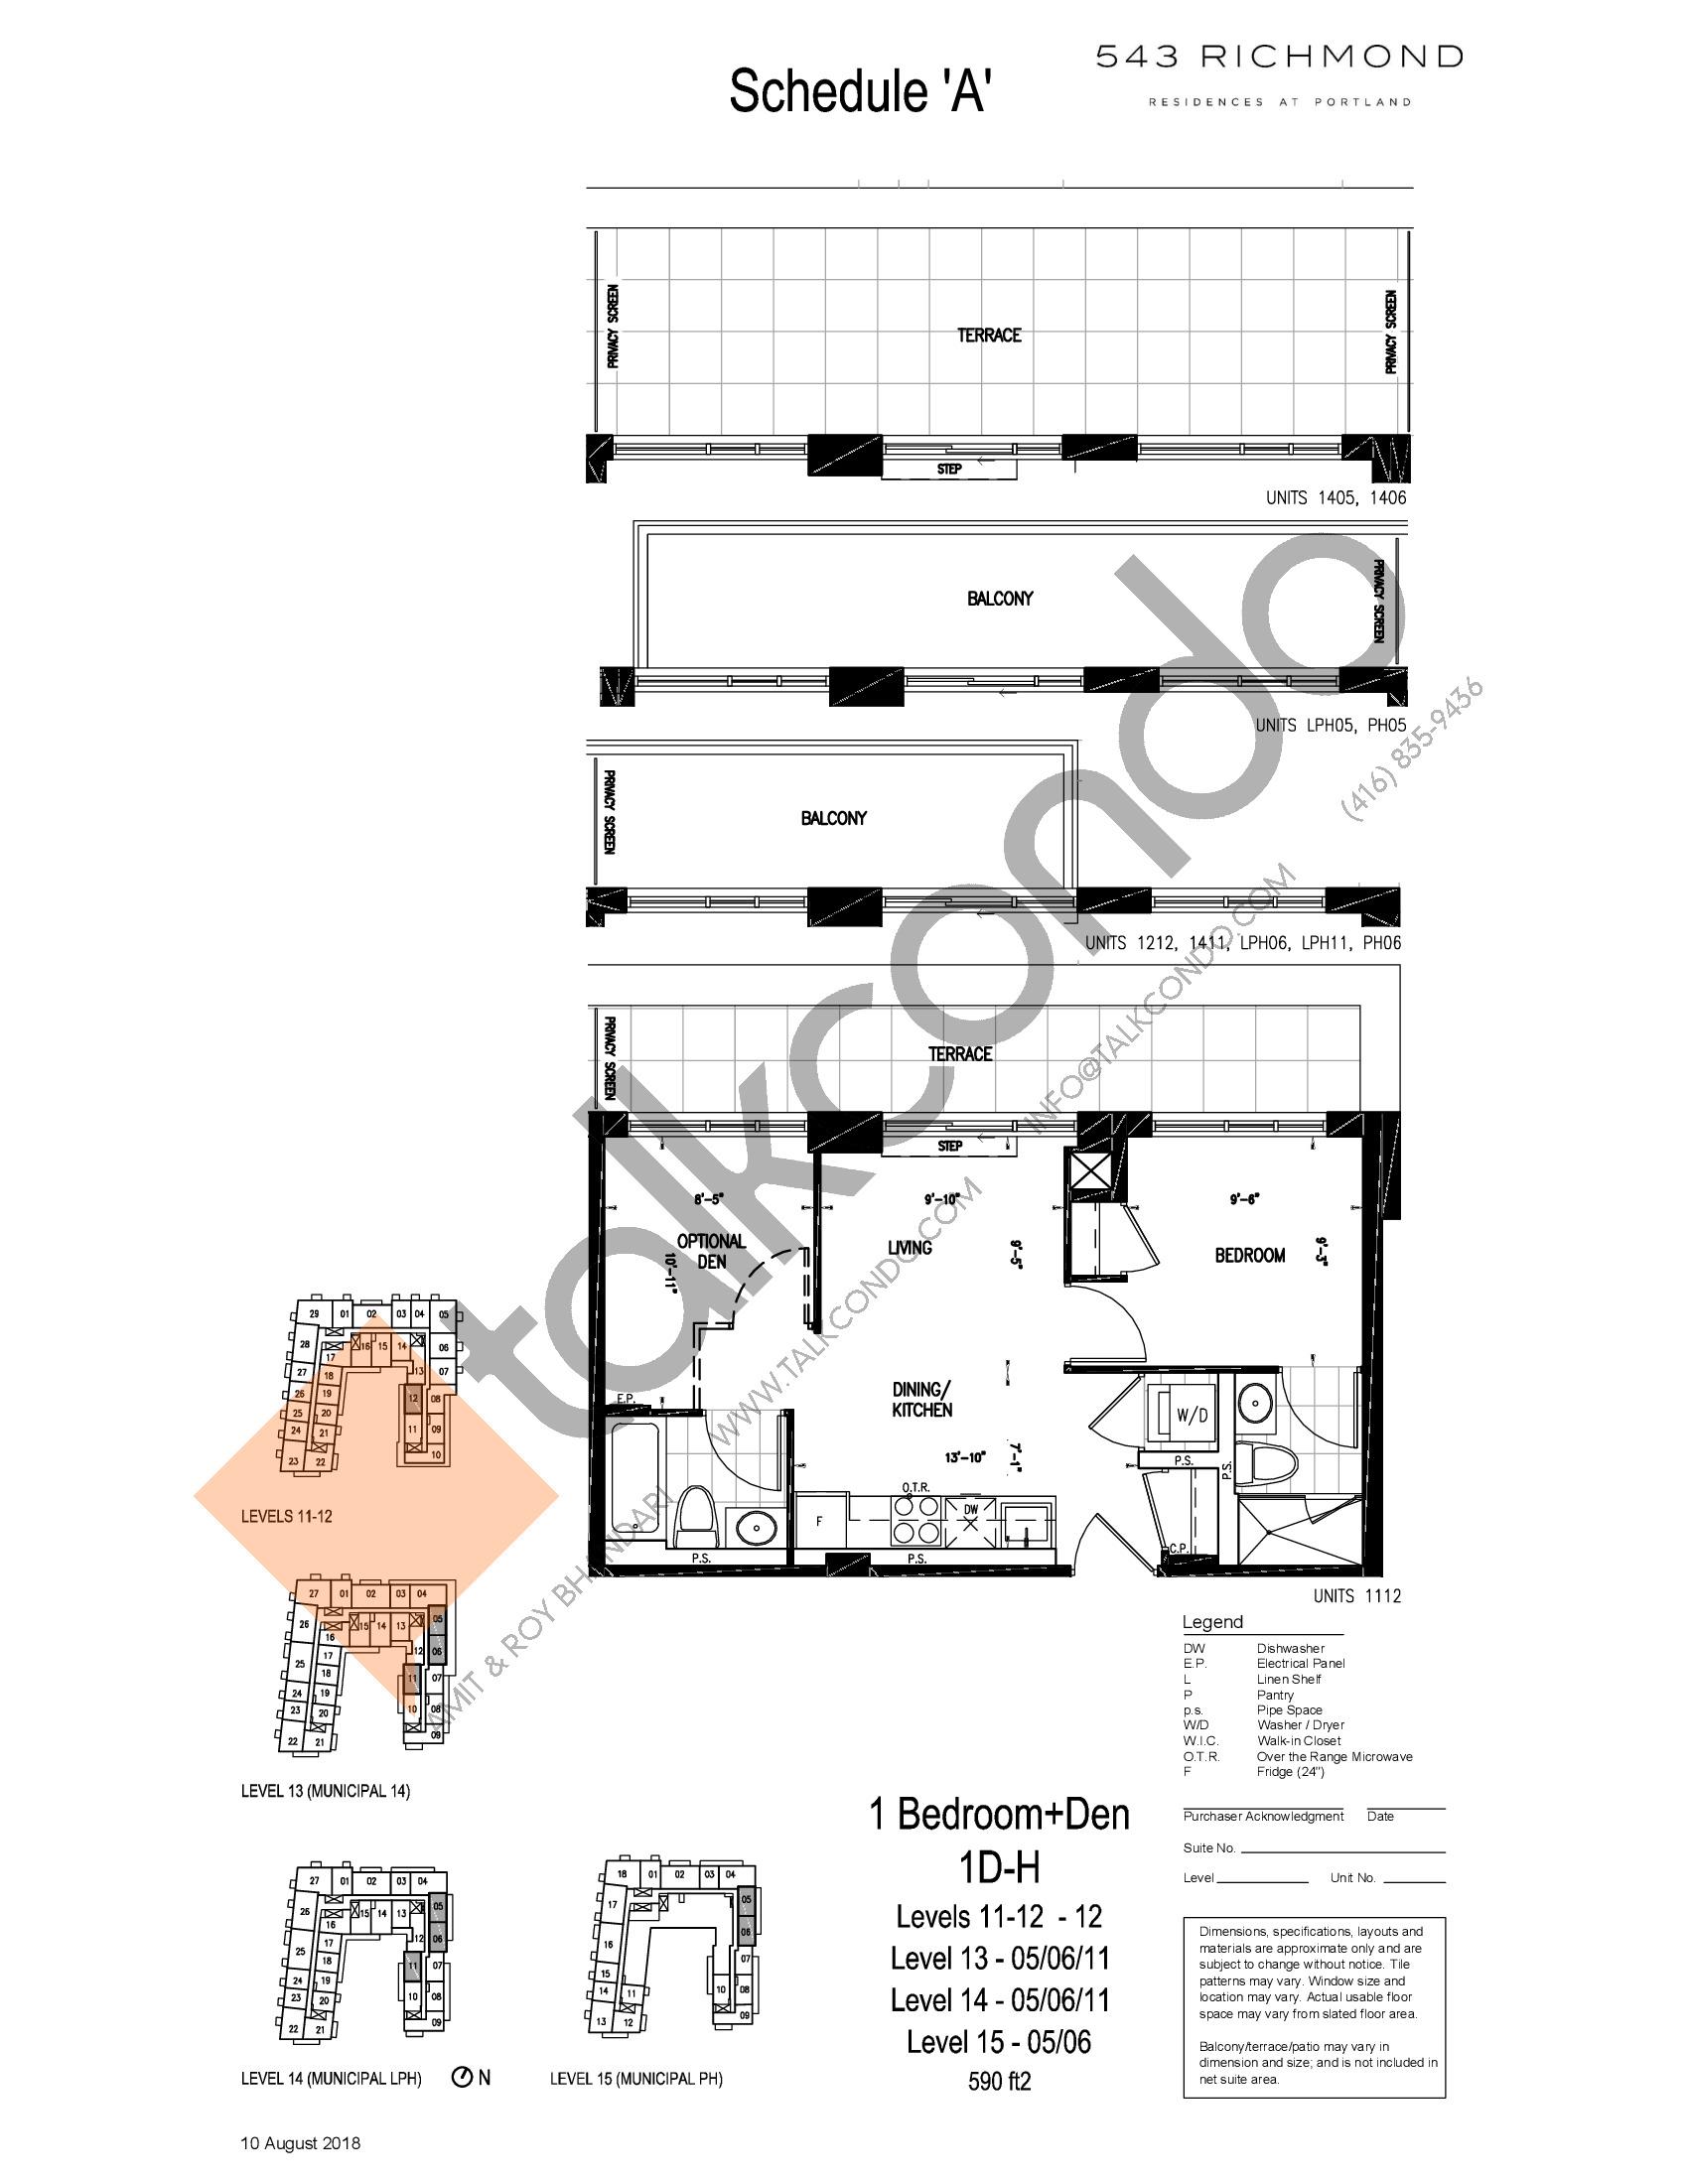 1D-H Floor Plan at 543 Richmond St Condos - 590 sq.ft